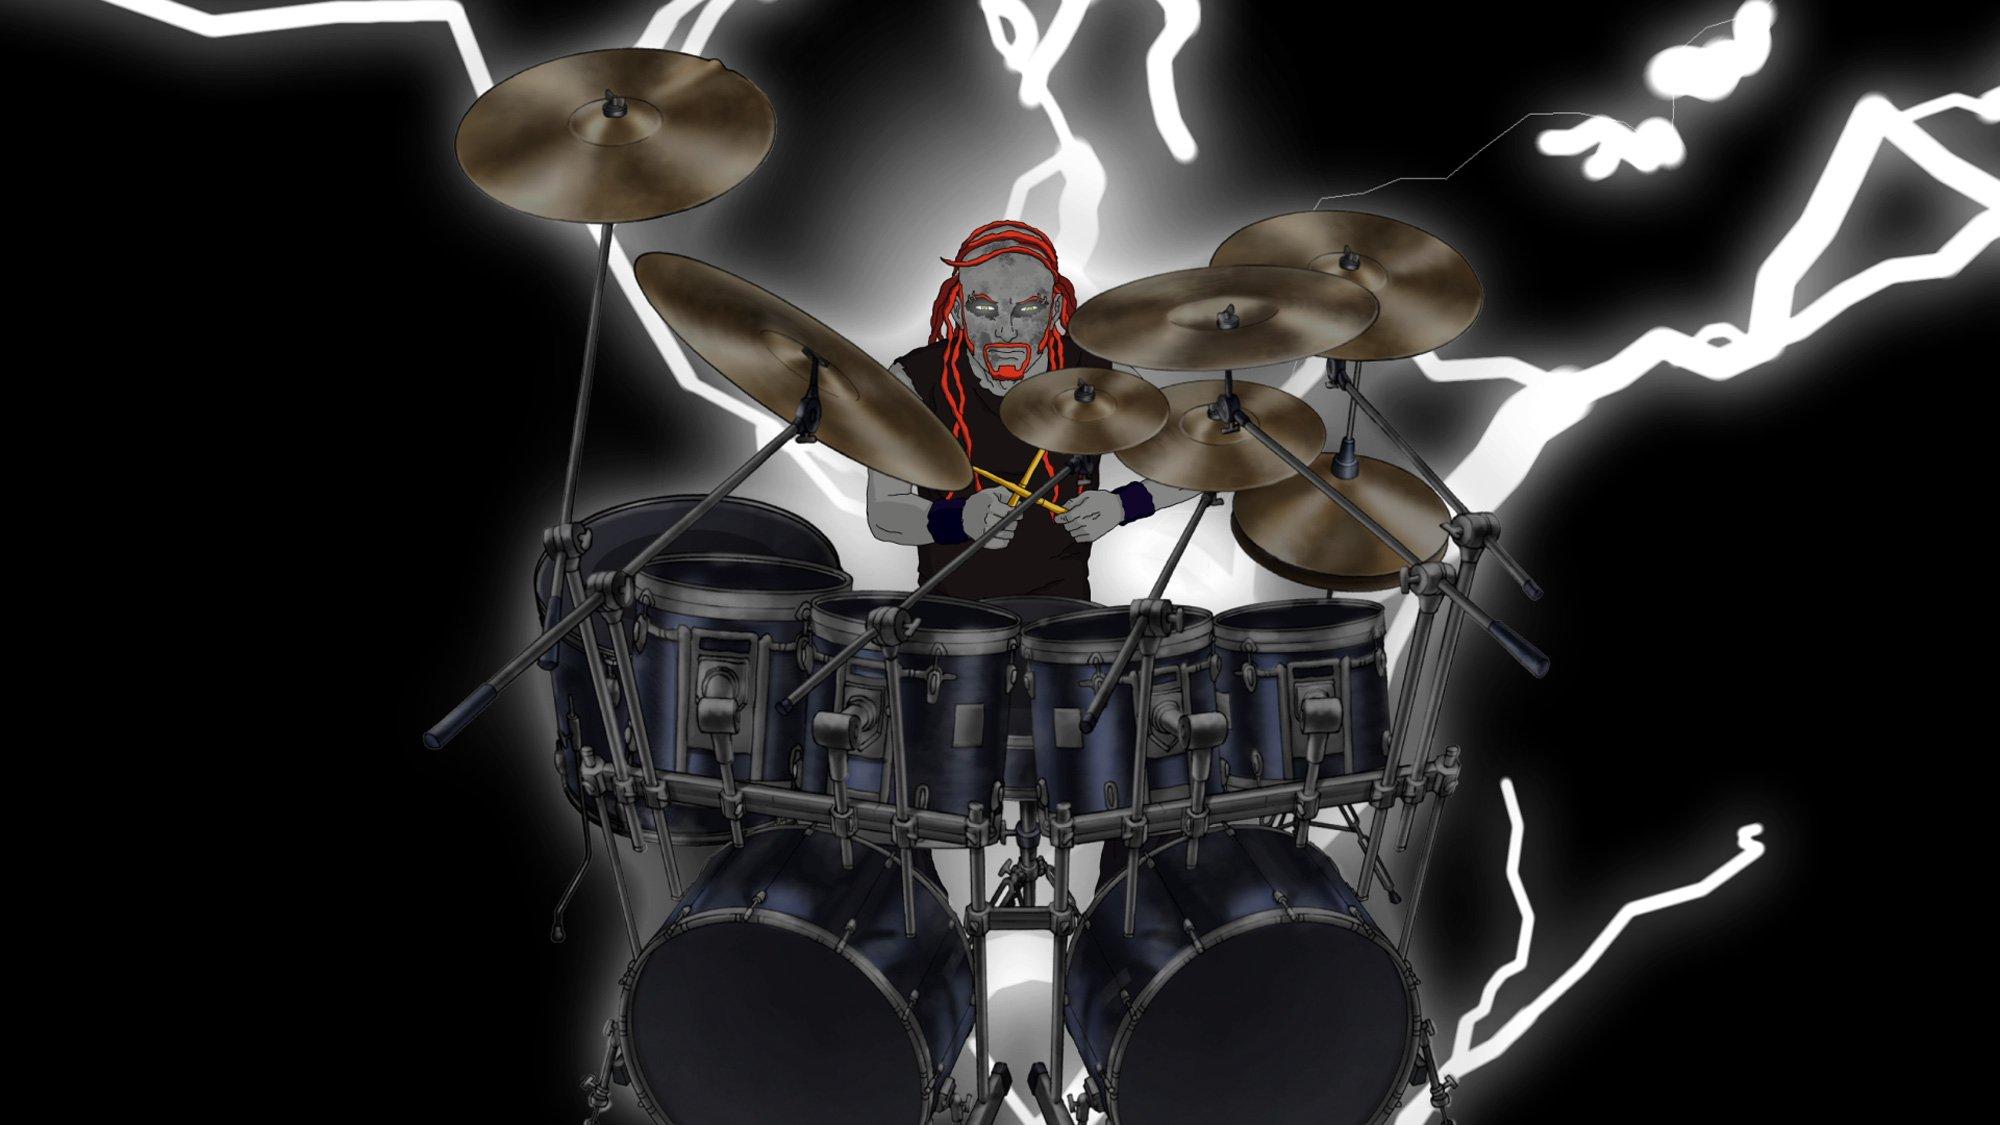 groups metalocalypse drums wallpaper 2000x1125 73972 WallpaperUP 2000x1125